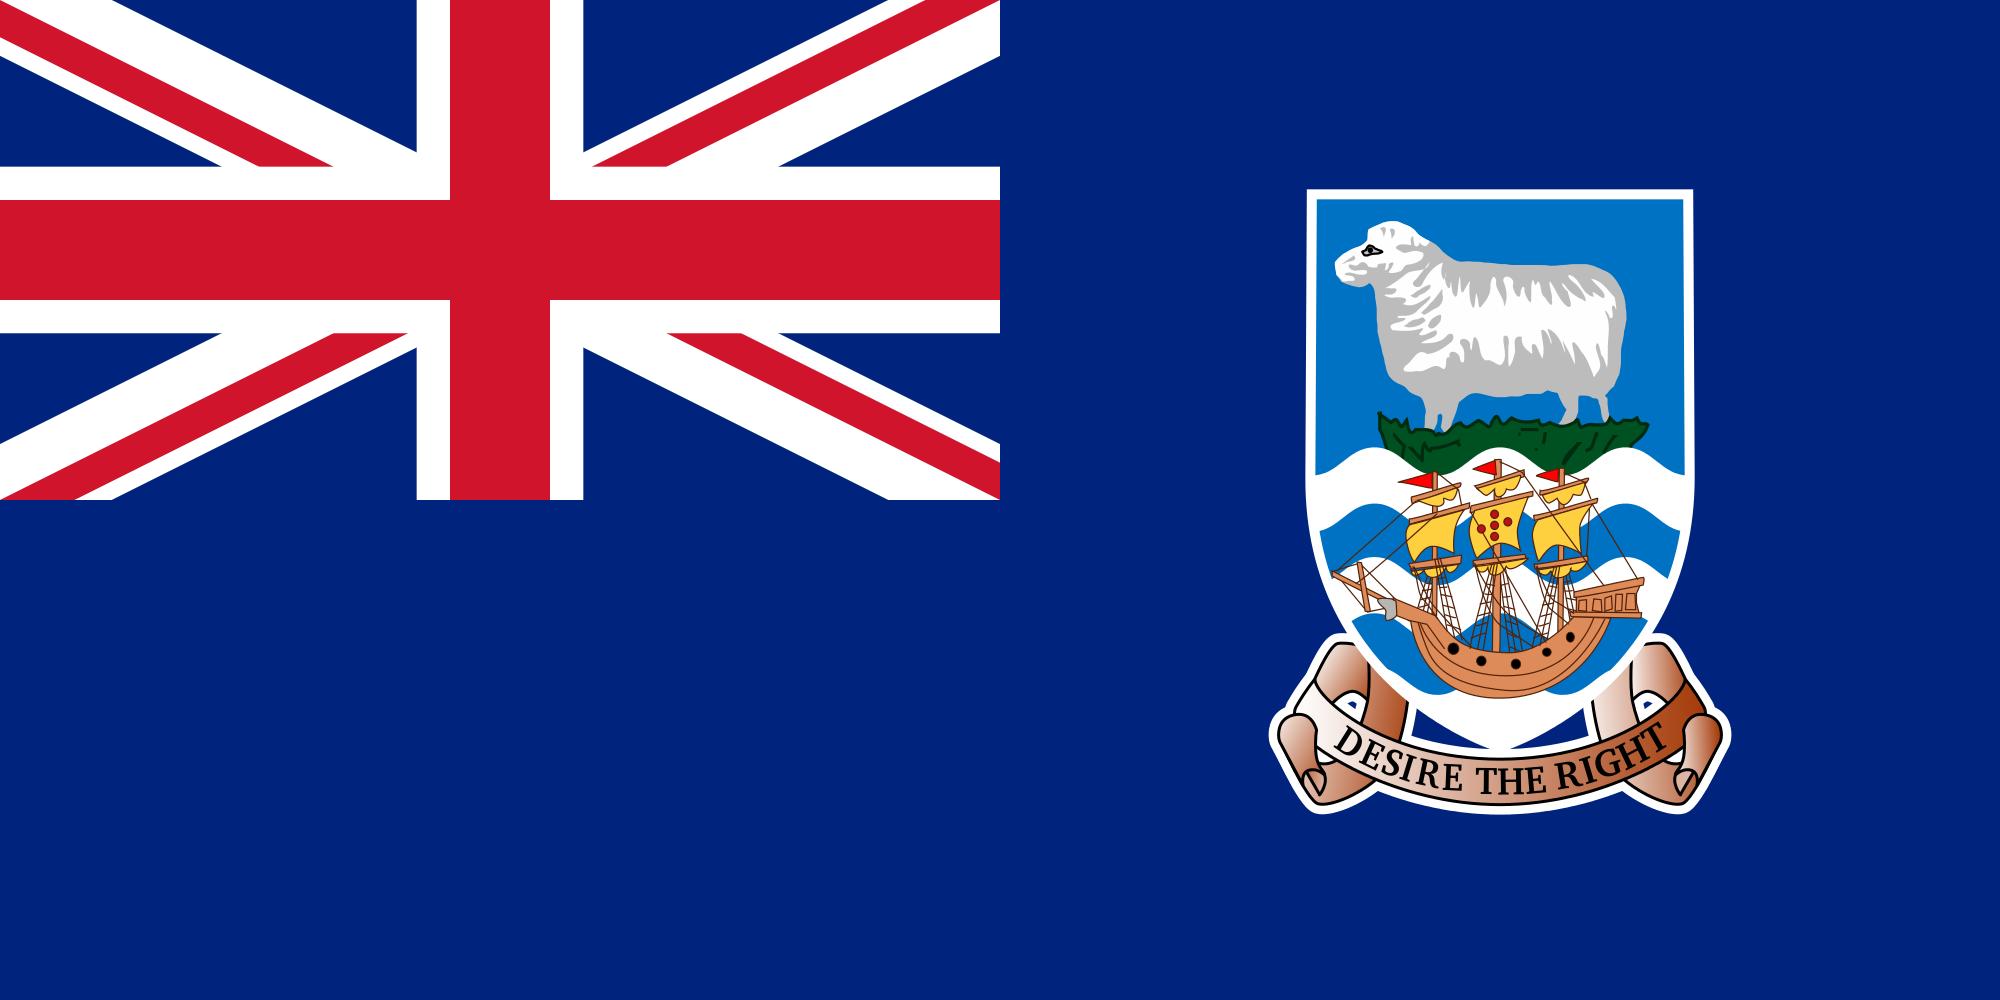 islas malvinas, país, emblema, insignia, símbolo - Fondos de Pantalla HD - professor-falken.com